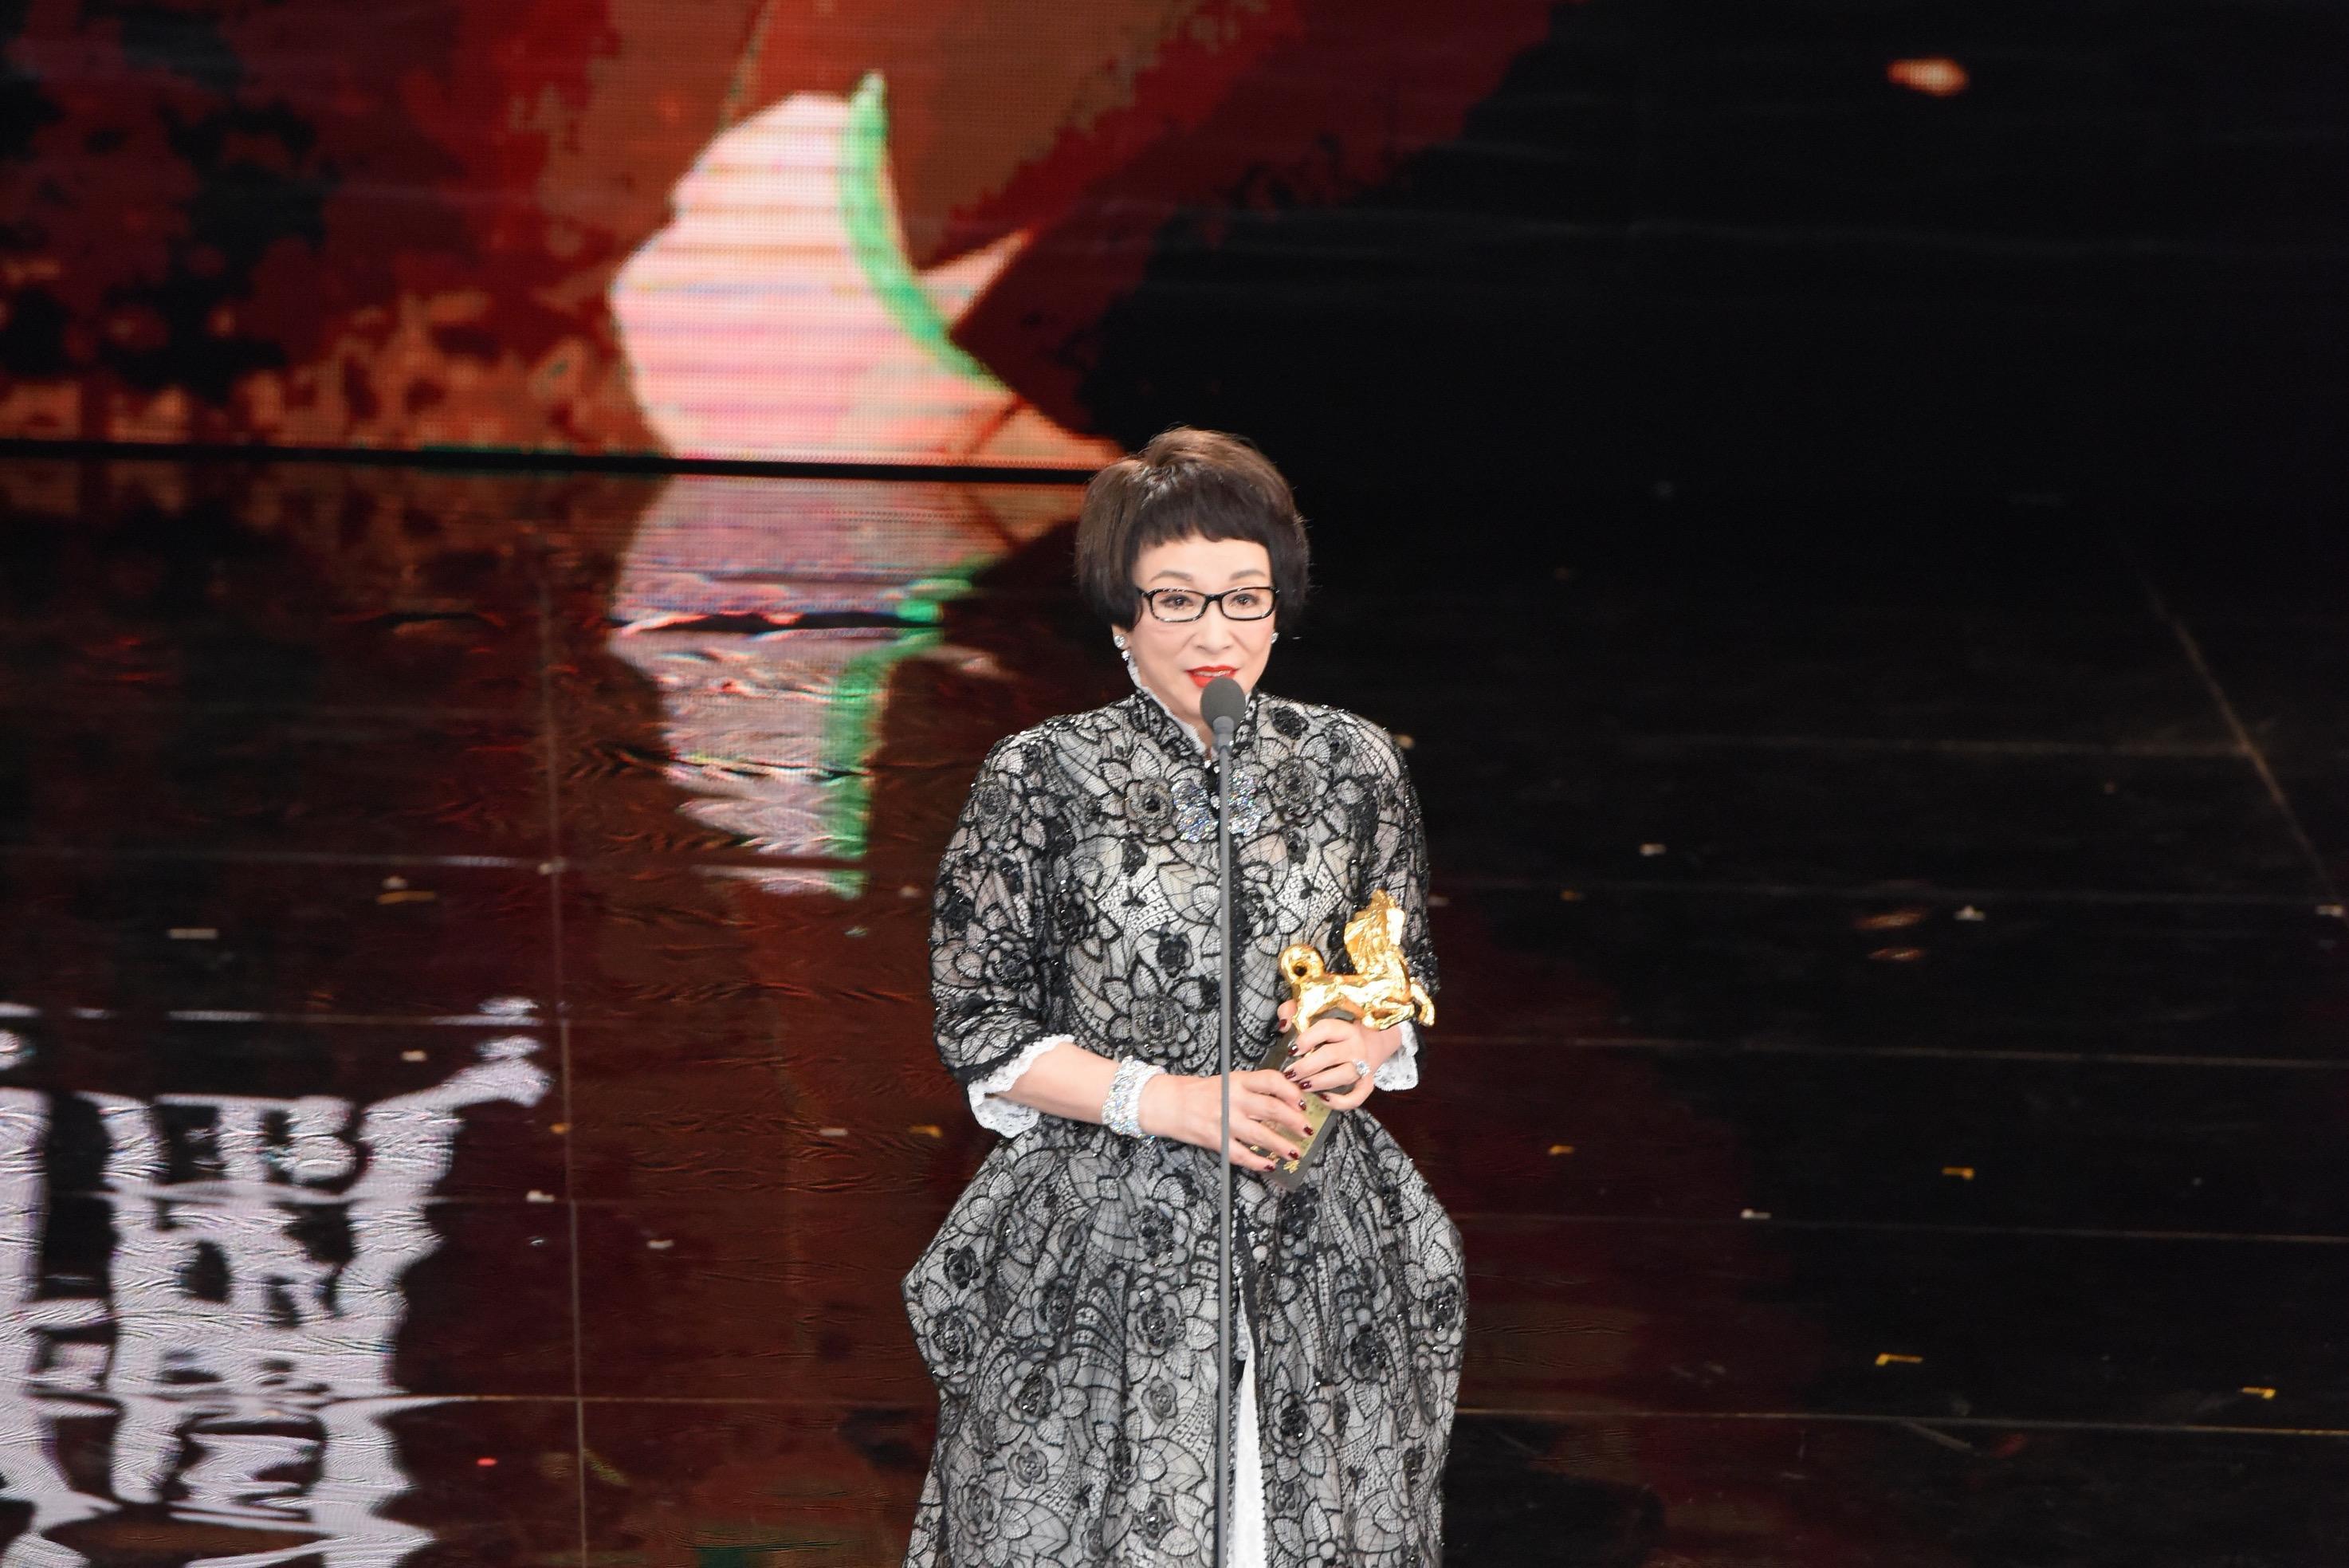 <p>第54屆金馬終身成就獎由「永遠的俠女」徐楓獲獎,她強調,拿到這個獎並不是結束,而是另一個開始,希望大家能為華語電影一起努力。(影像:達志影像提供) </p>